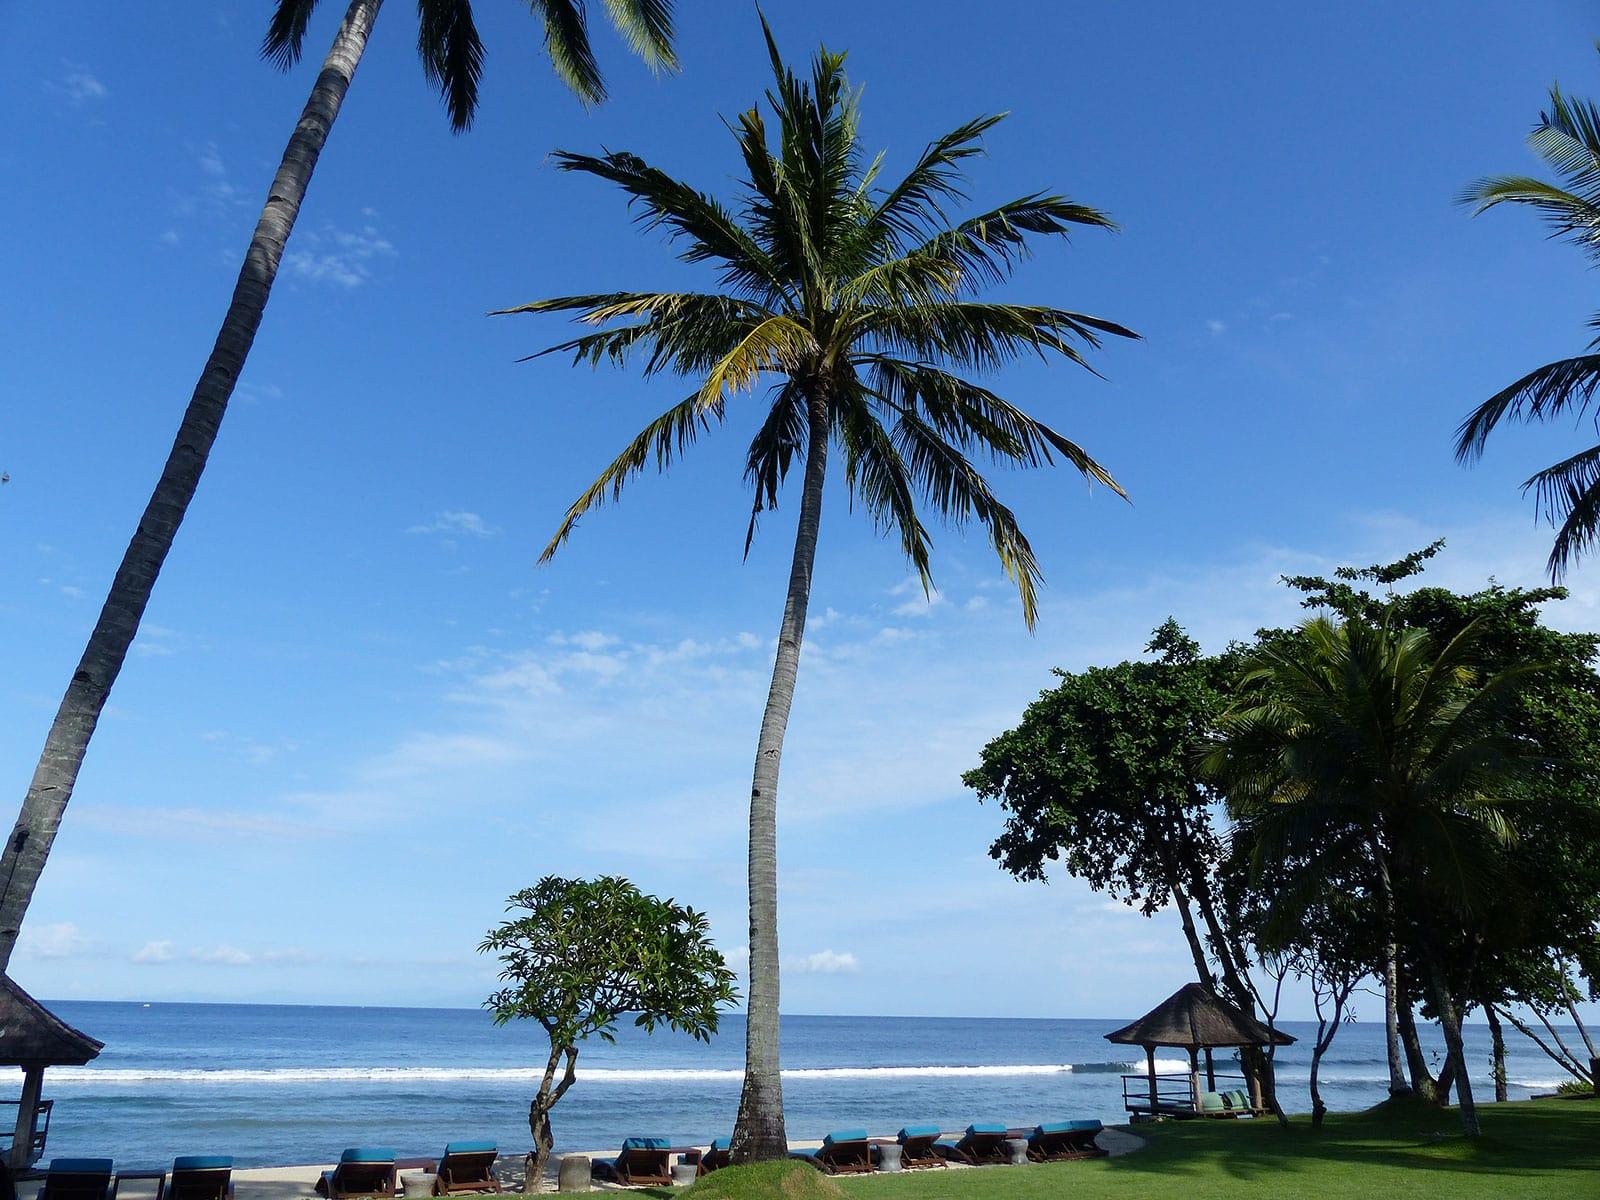 rondreis lombok senggigi jeeva klui resort 10